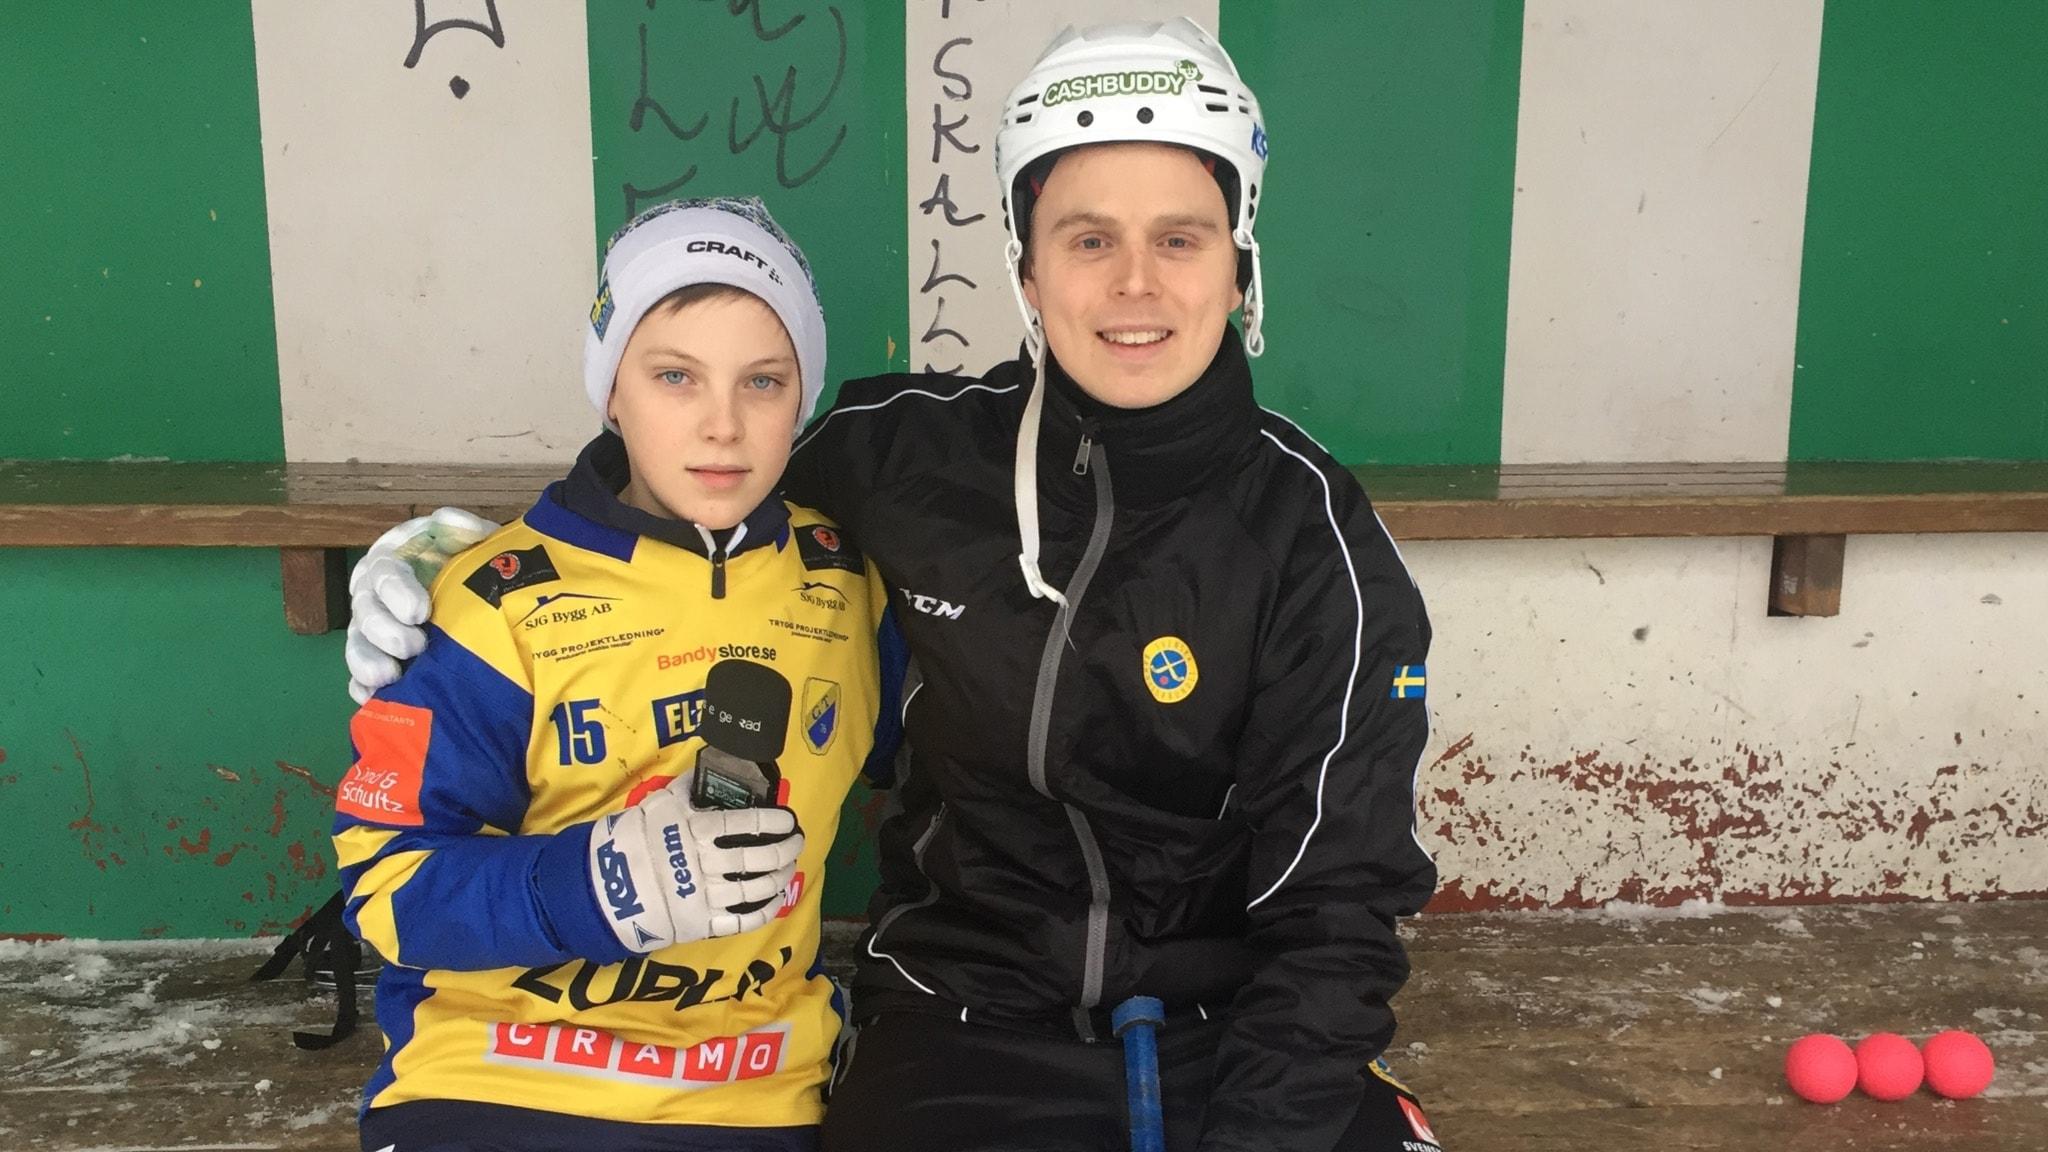 11-årige Olle får intervjua sin bandyidol